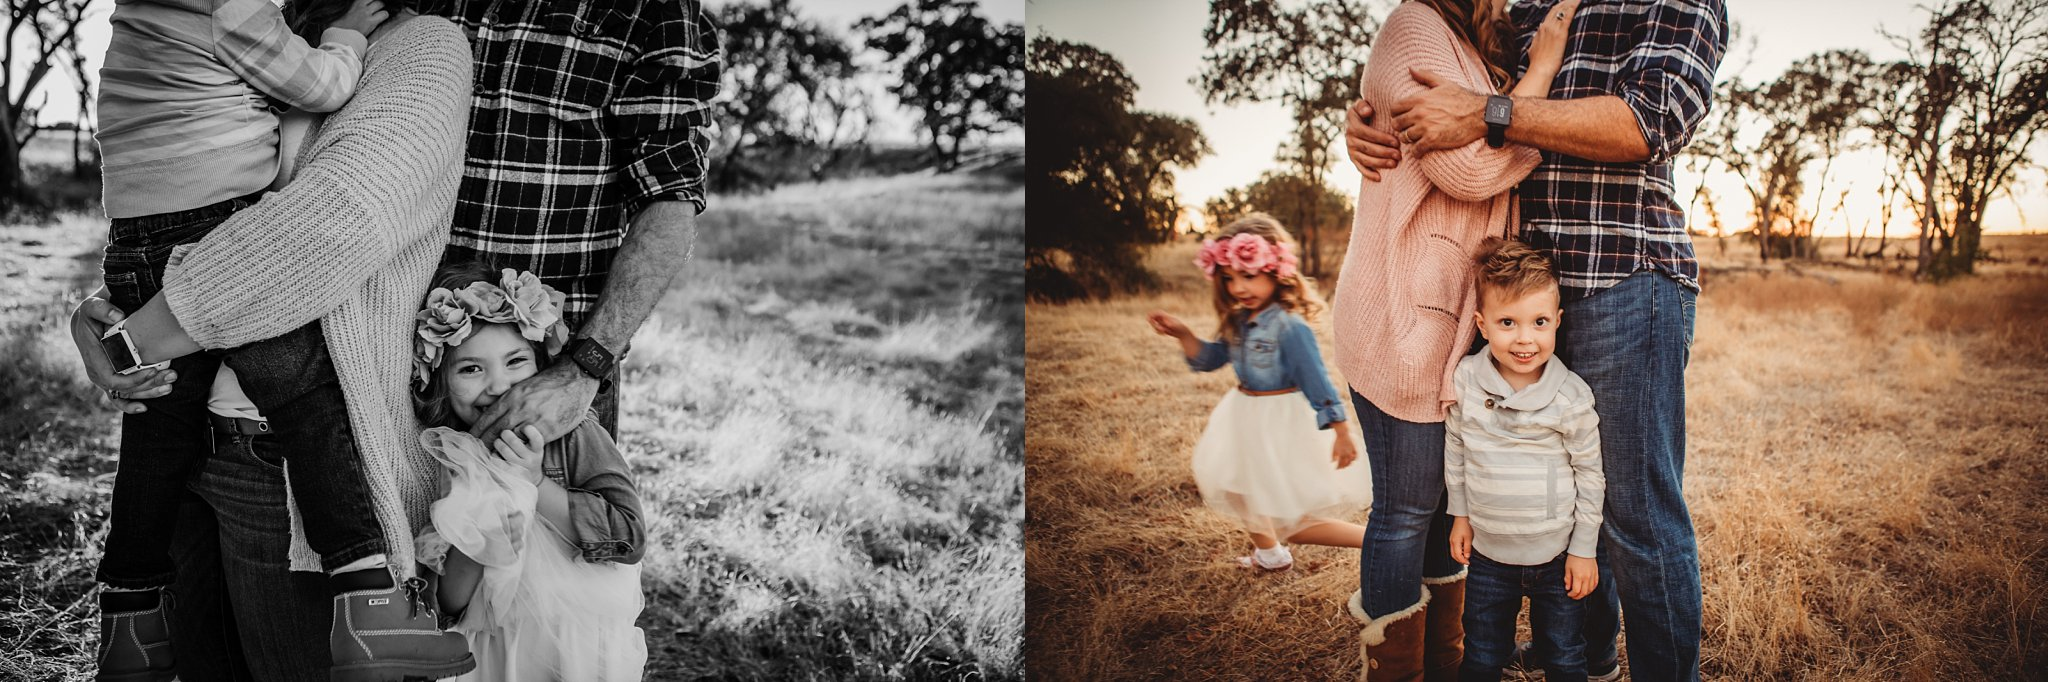 Becci Ravera Photography Family Newborn Photograper_0099.jpg